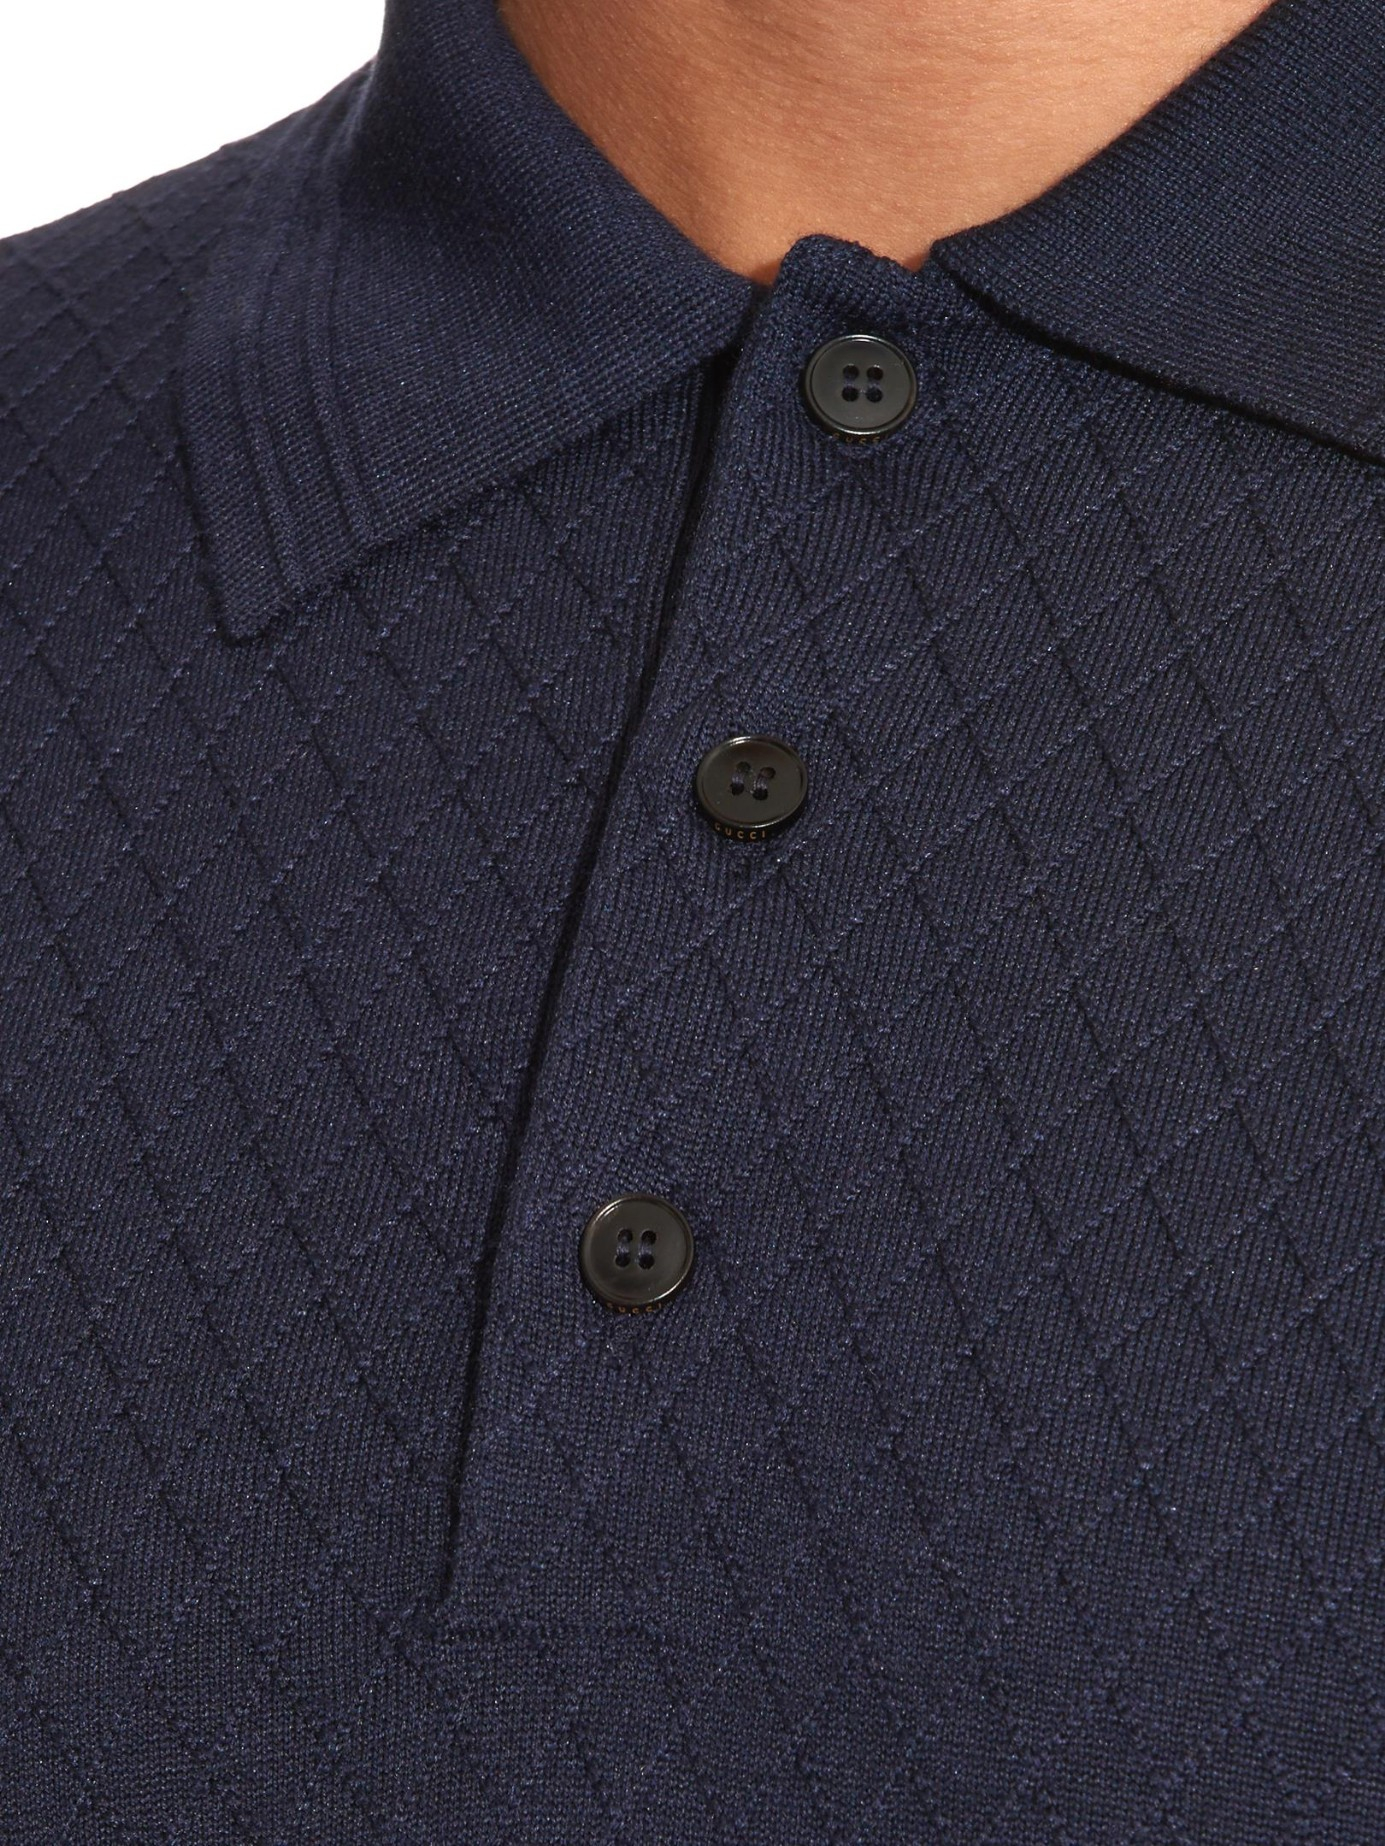 Lyst - Gucci Diamond-stitch Wool-blend Knit Polo Shirt in Blue for Men 3efa3d3d3c99